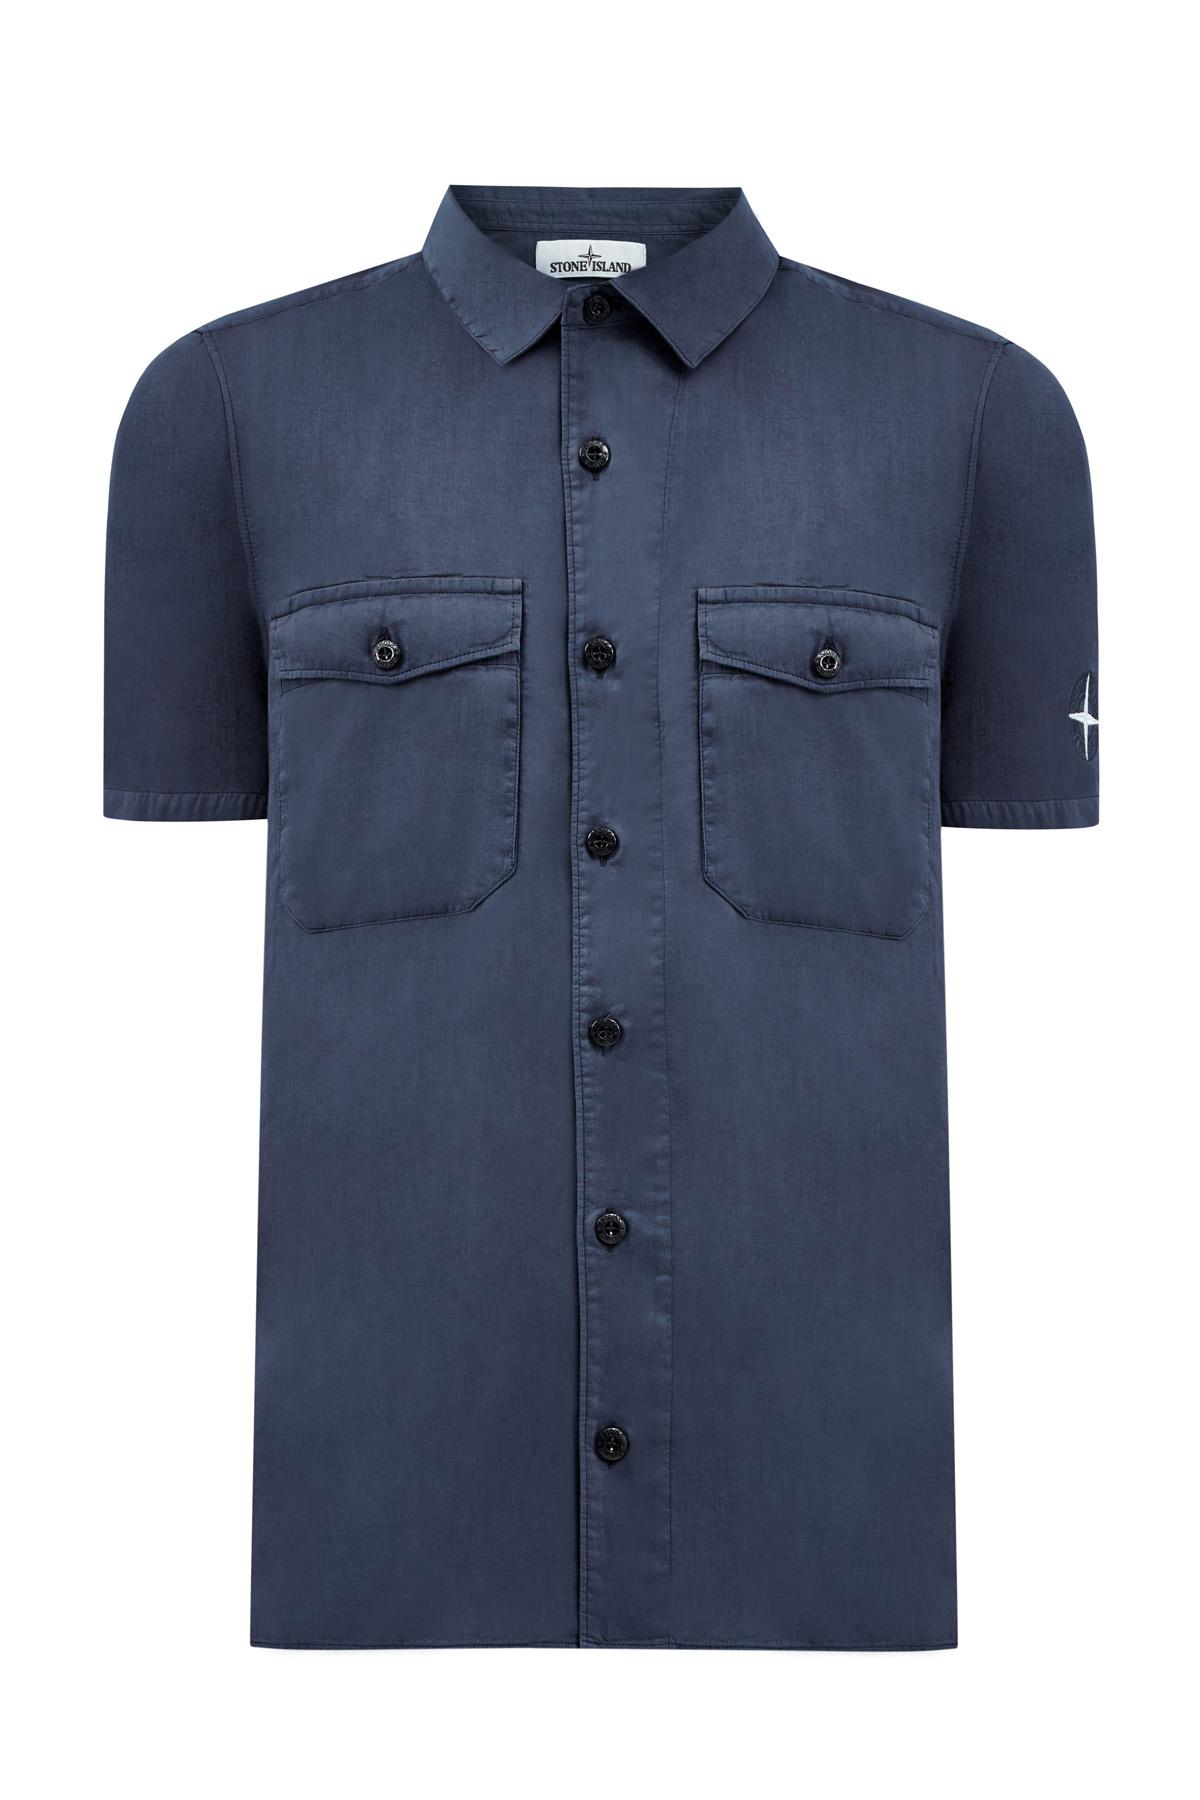 Рубашка скороткими рукавами издвухслойного хлопкового муслина